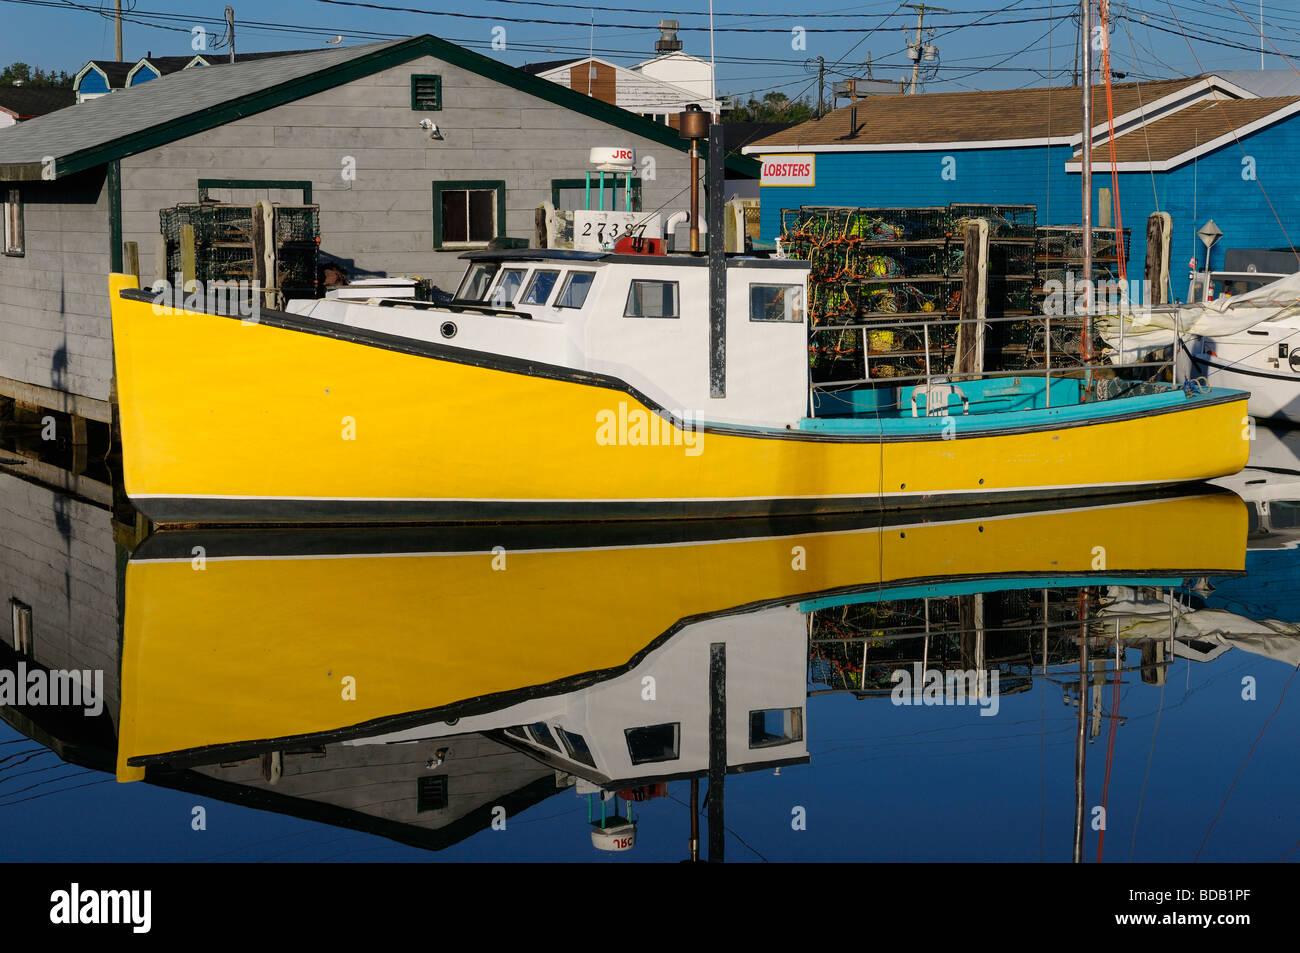 Langosta amarilla barco en agua azul tranquila en Fishermans Cove este pasaje de Halifax, Nova Scotia Imagen De Stock